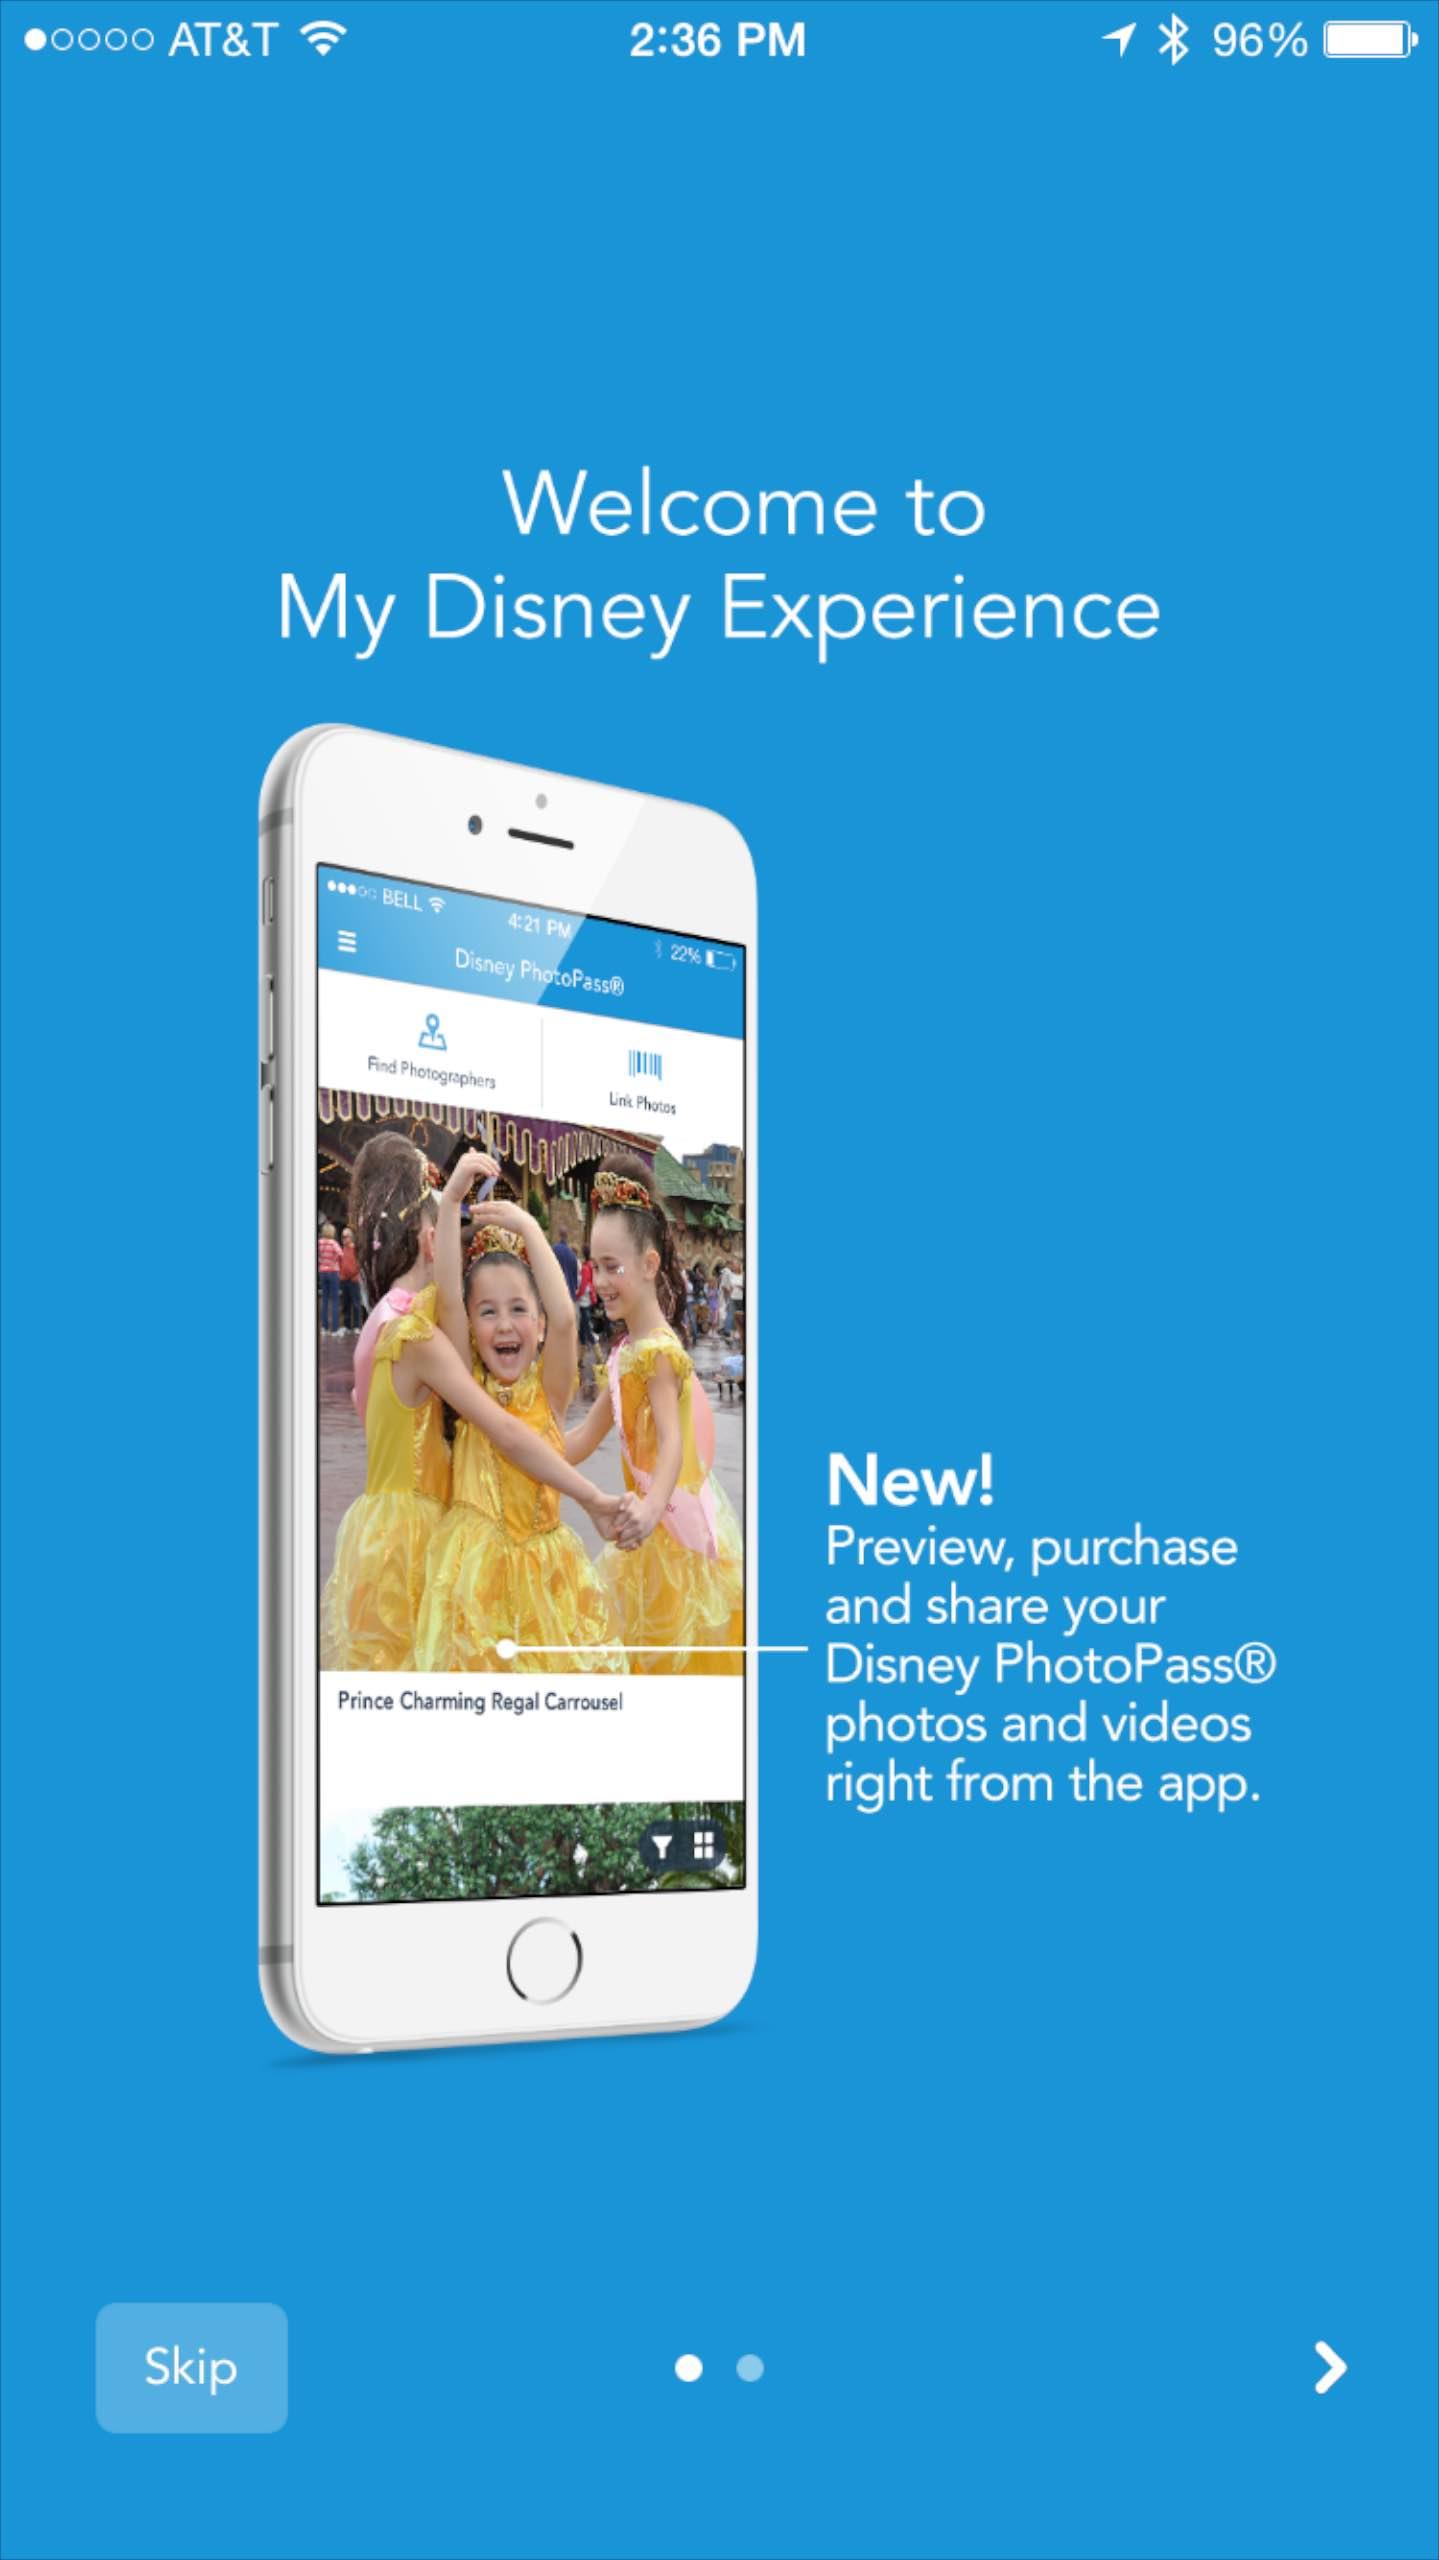 My Disney Experience PhotoPass screenshot - What's new